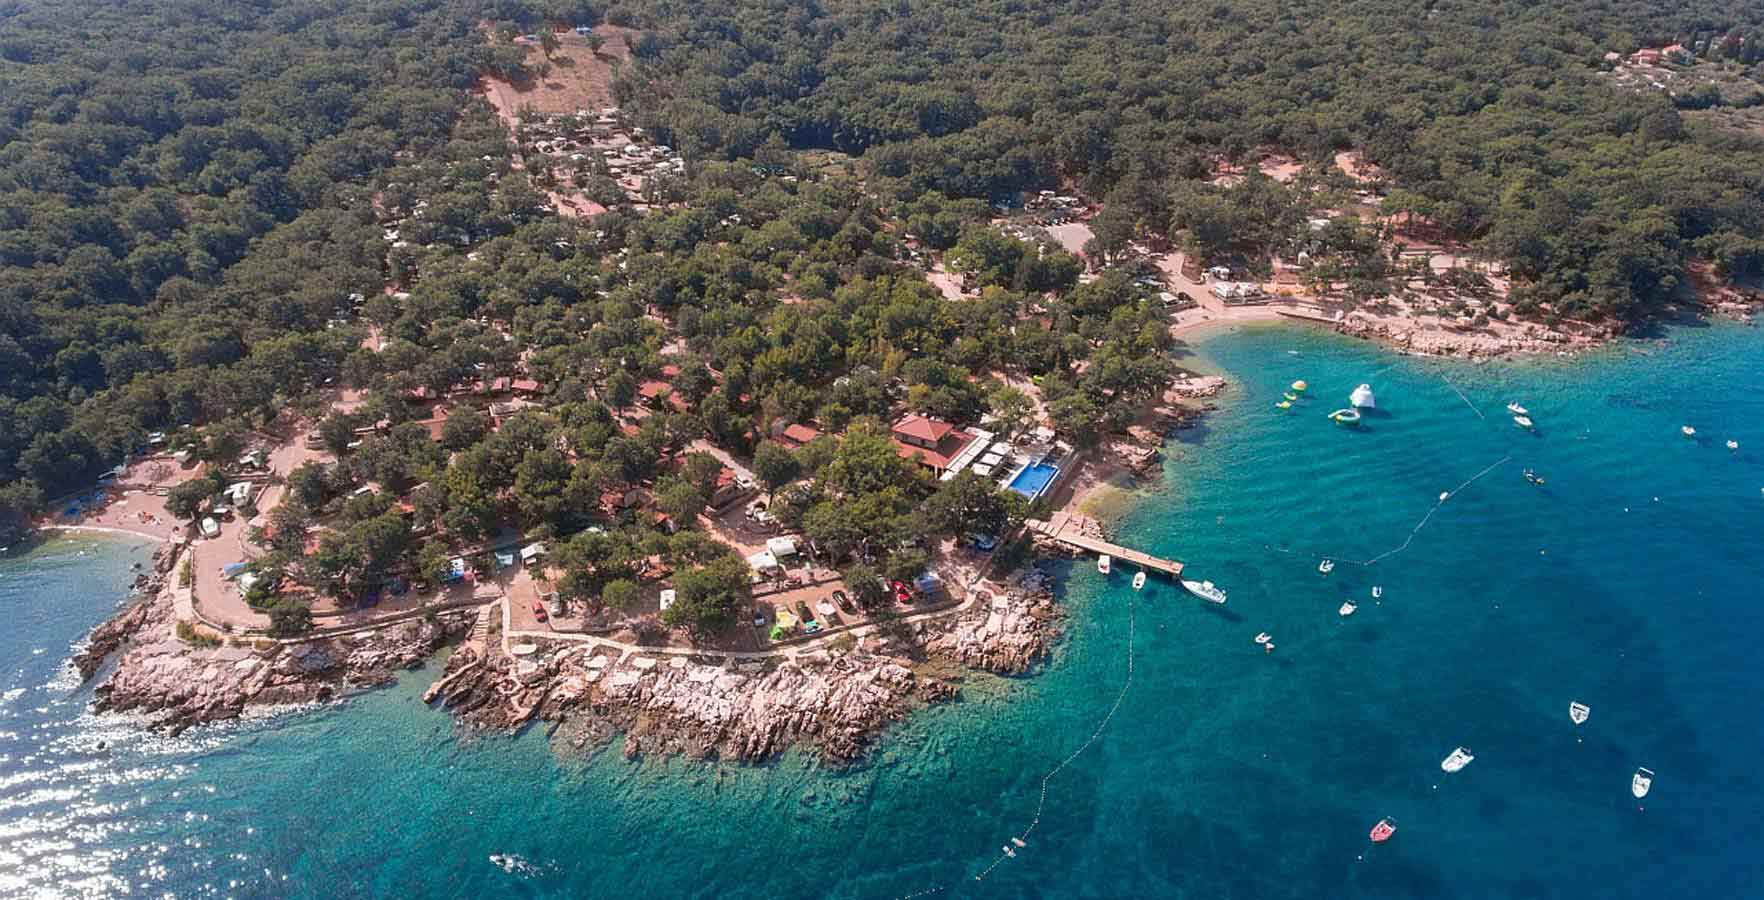 Campingplatz Glavotok - Campingverband Kroatien